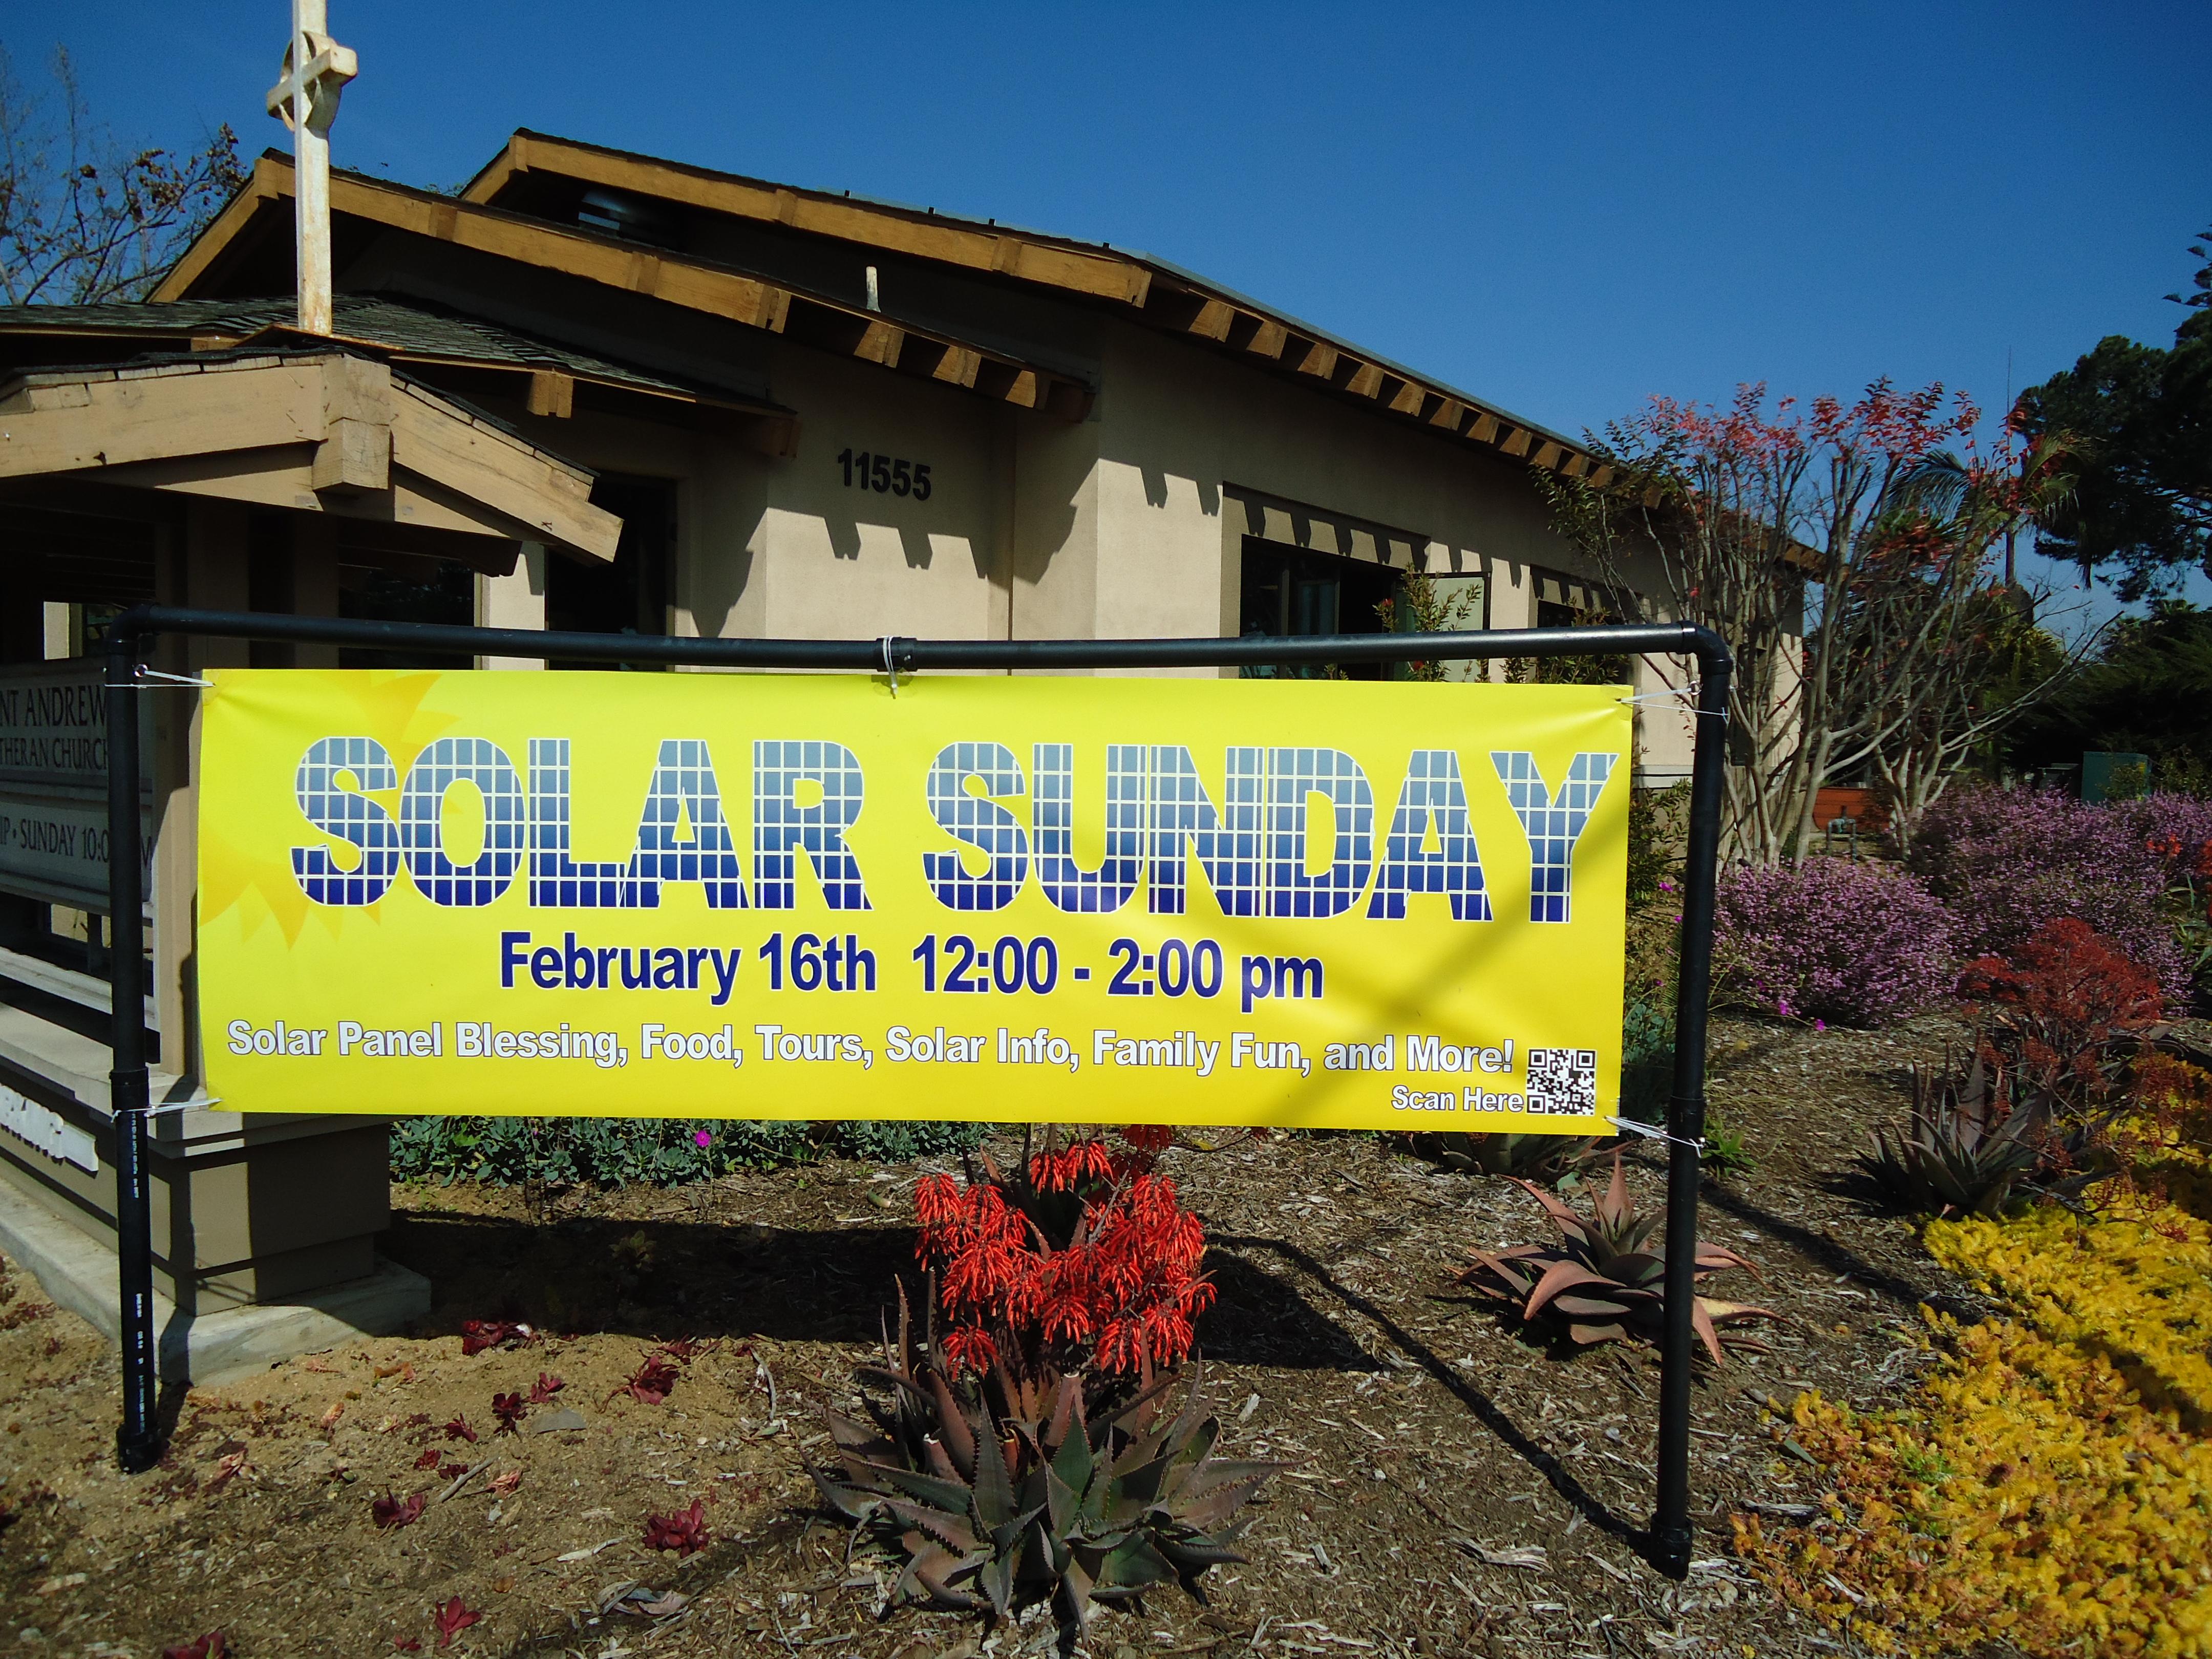 Solar Sunday at St. Andrew's Lutheran Church